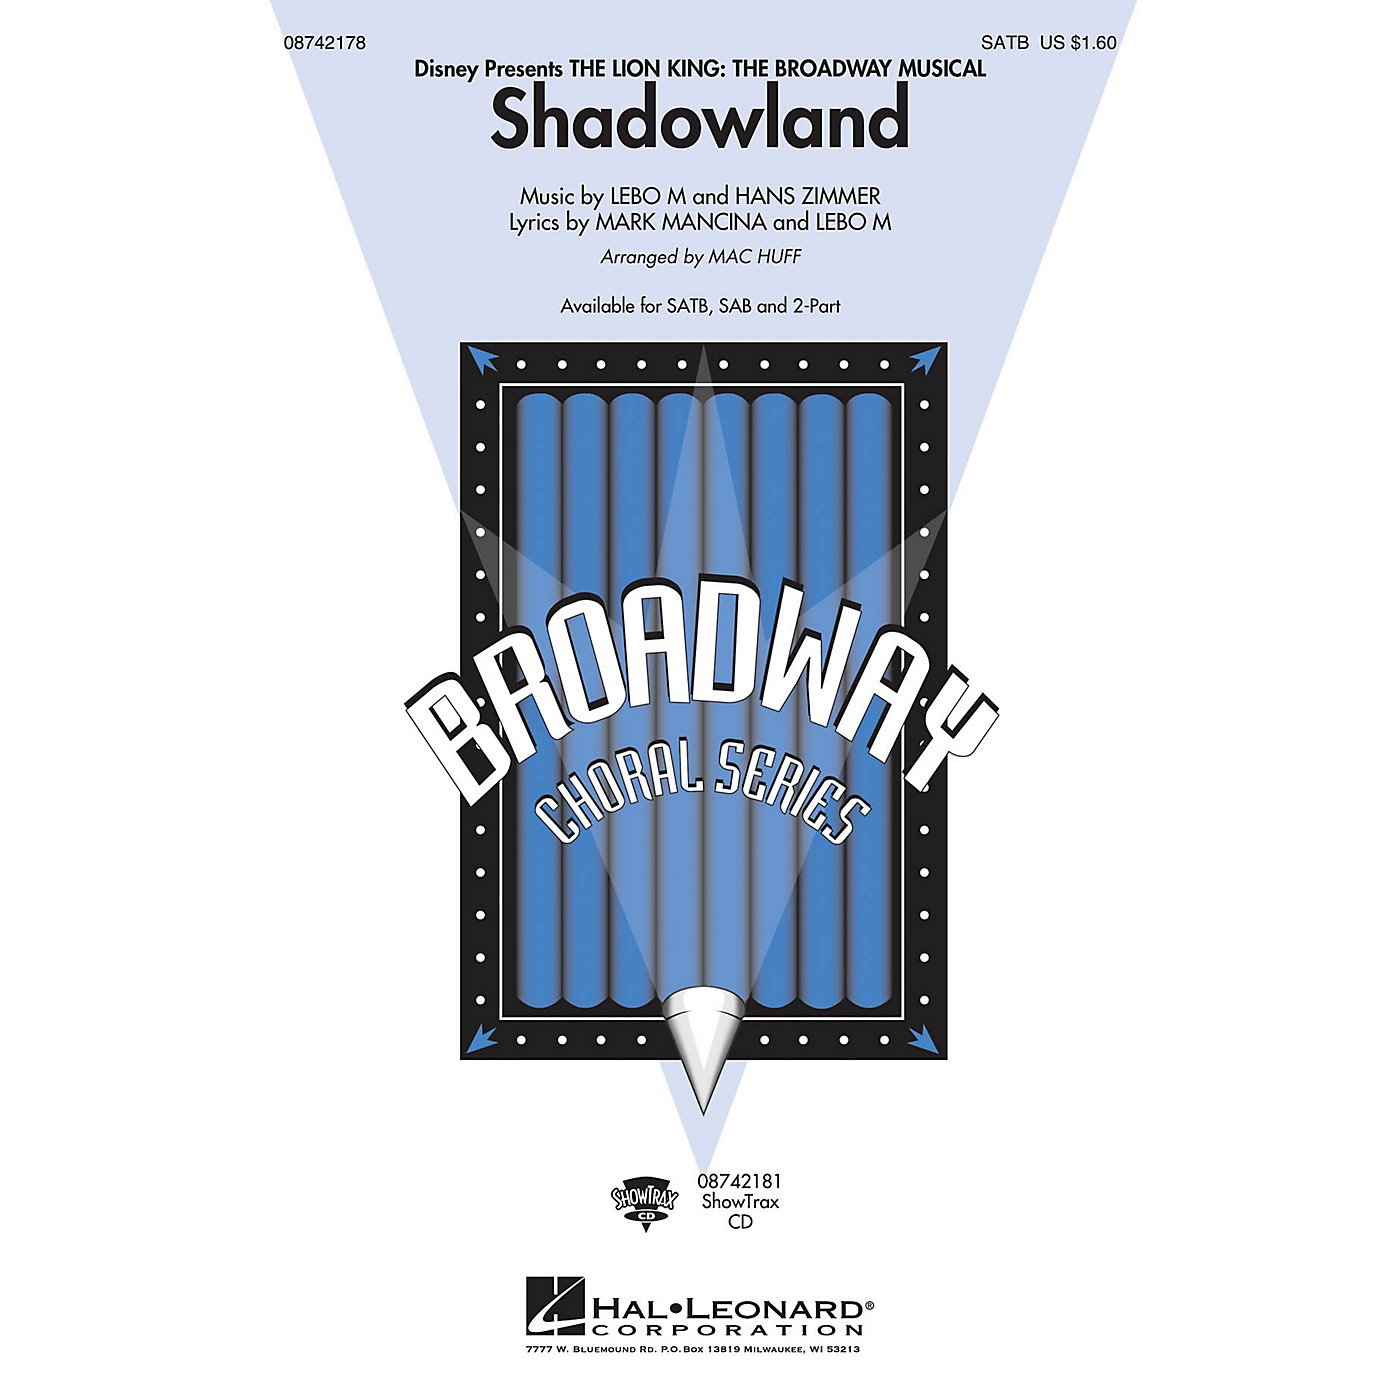 Hal Leonard Shadowland (from The Lion King: The Broadway Musical) (SAB) SAB Arranged by Mac Huff thumbnail